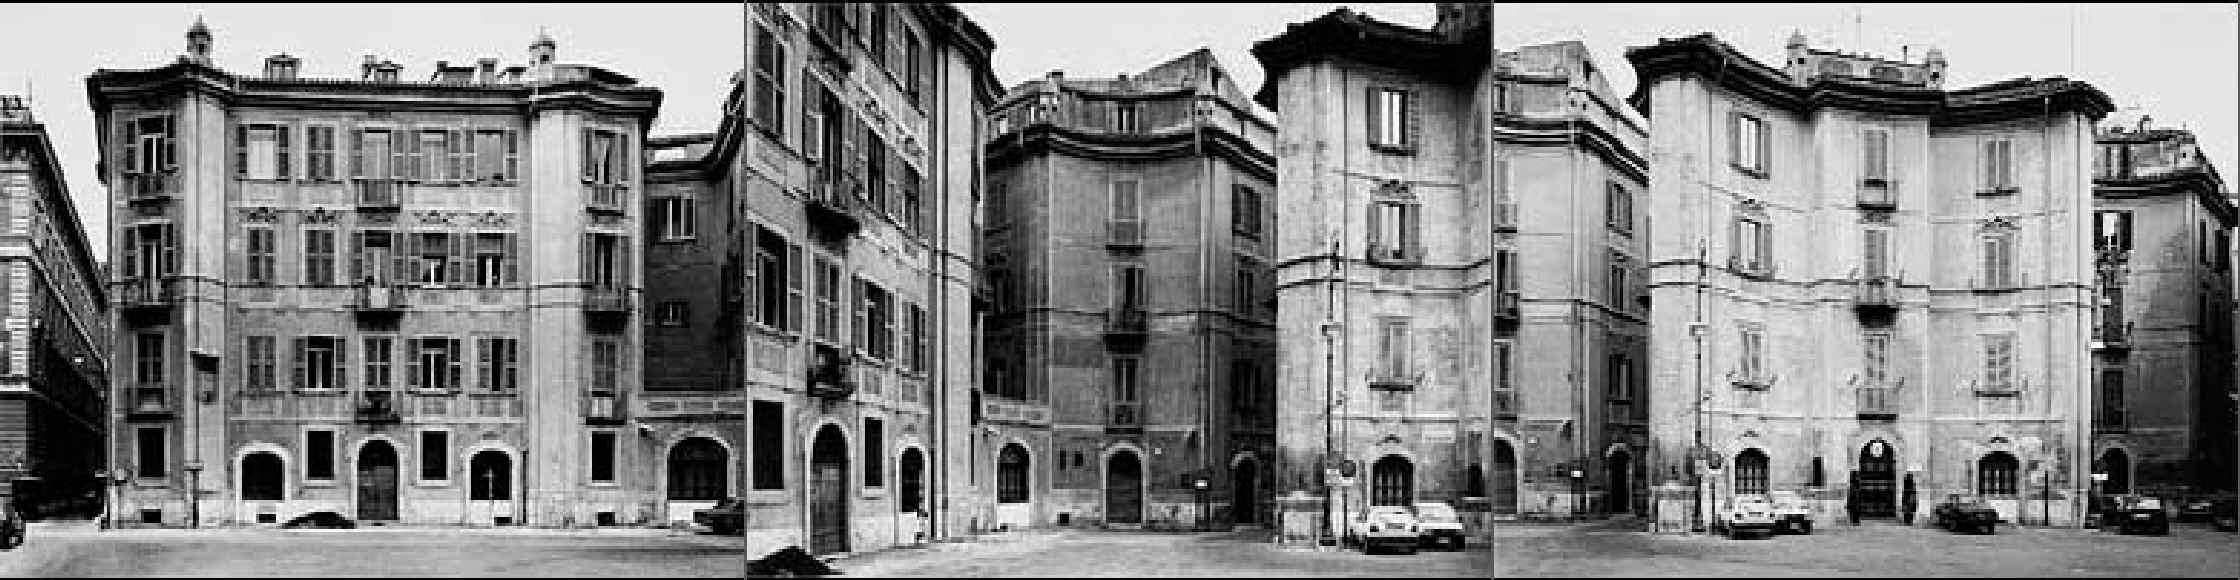 STRUTH, Thomas, <i>Piazza San Ignazio I-III, Rome</i>